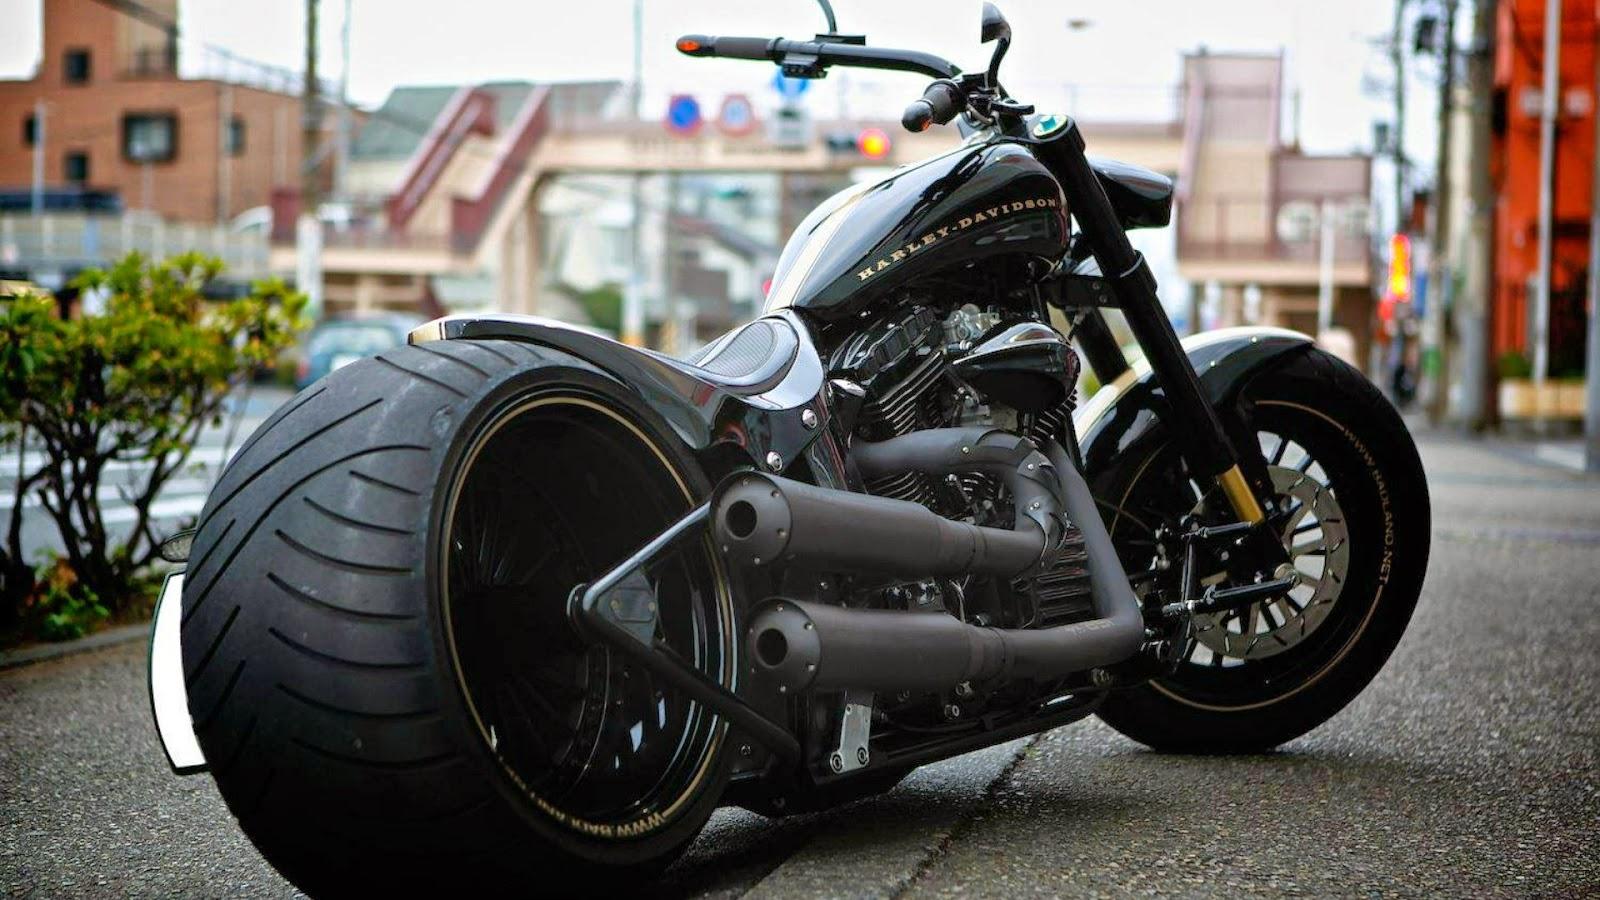 Moto Chopper Harley Davidson - HD Wallpaper